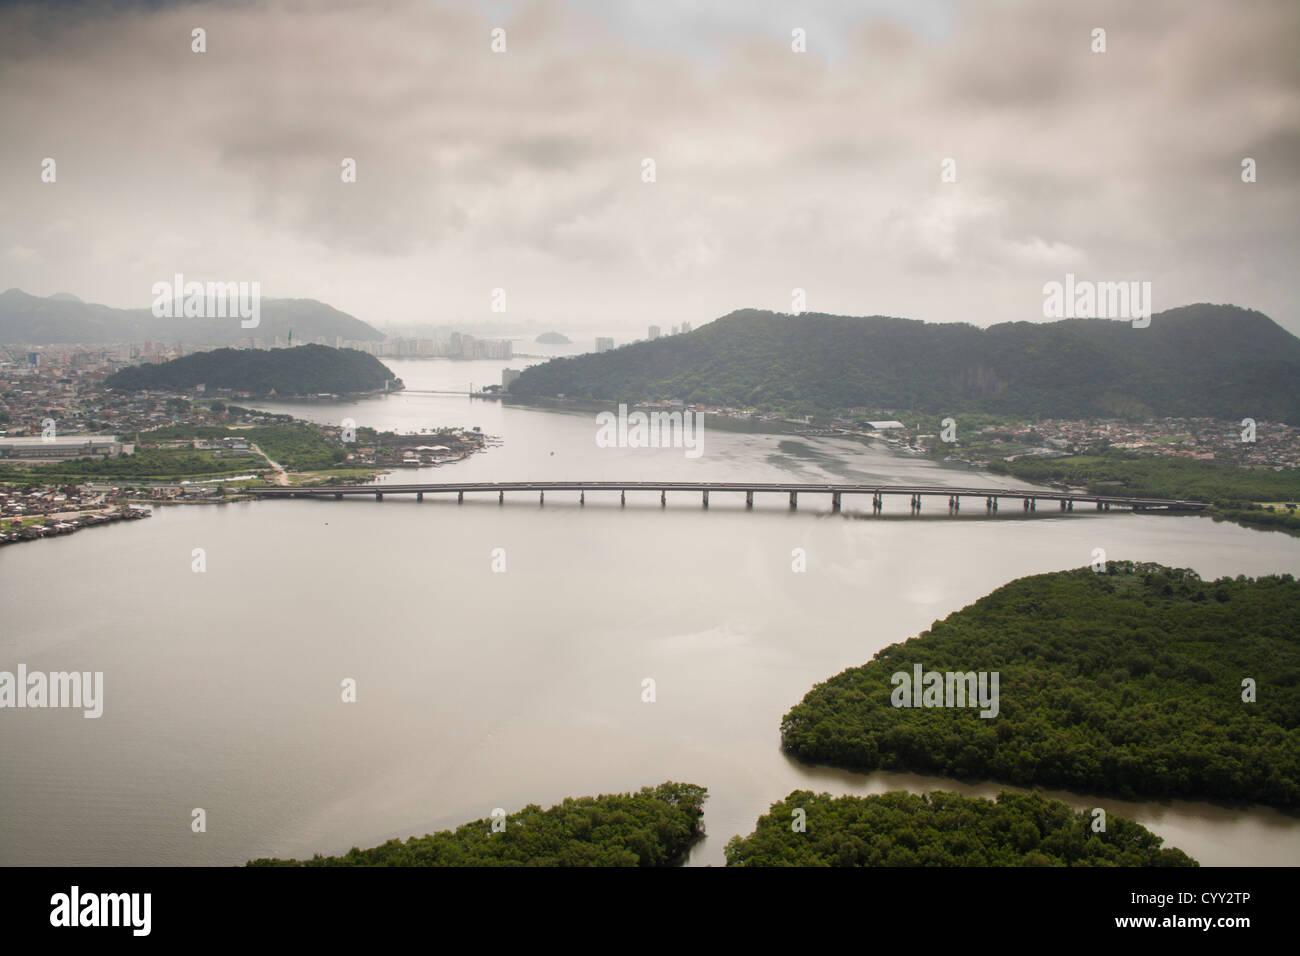 Aerial view of Ponte do Mar Pequeno bridge, connecting Sao Vicente to Praia Grande cities in Sao paulo state shore, Brazil Stock Photo